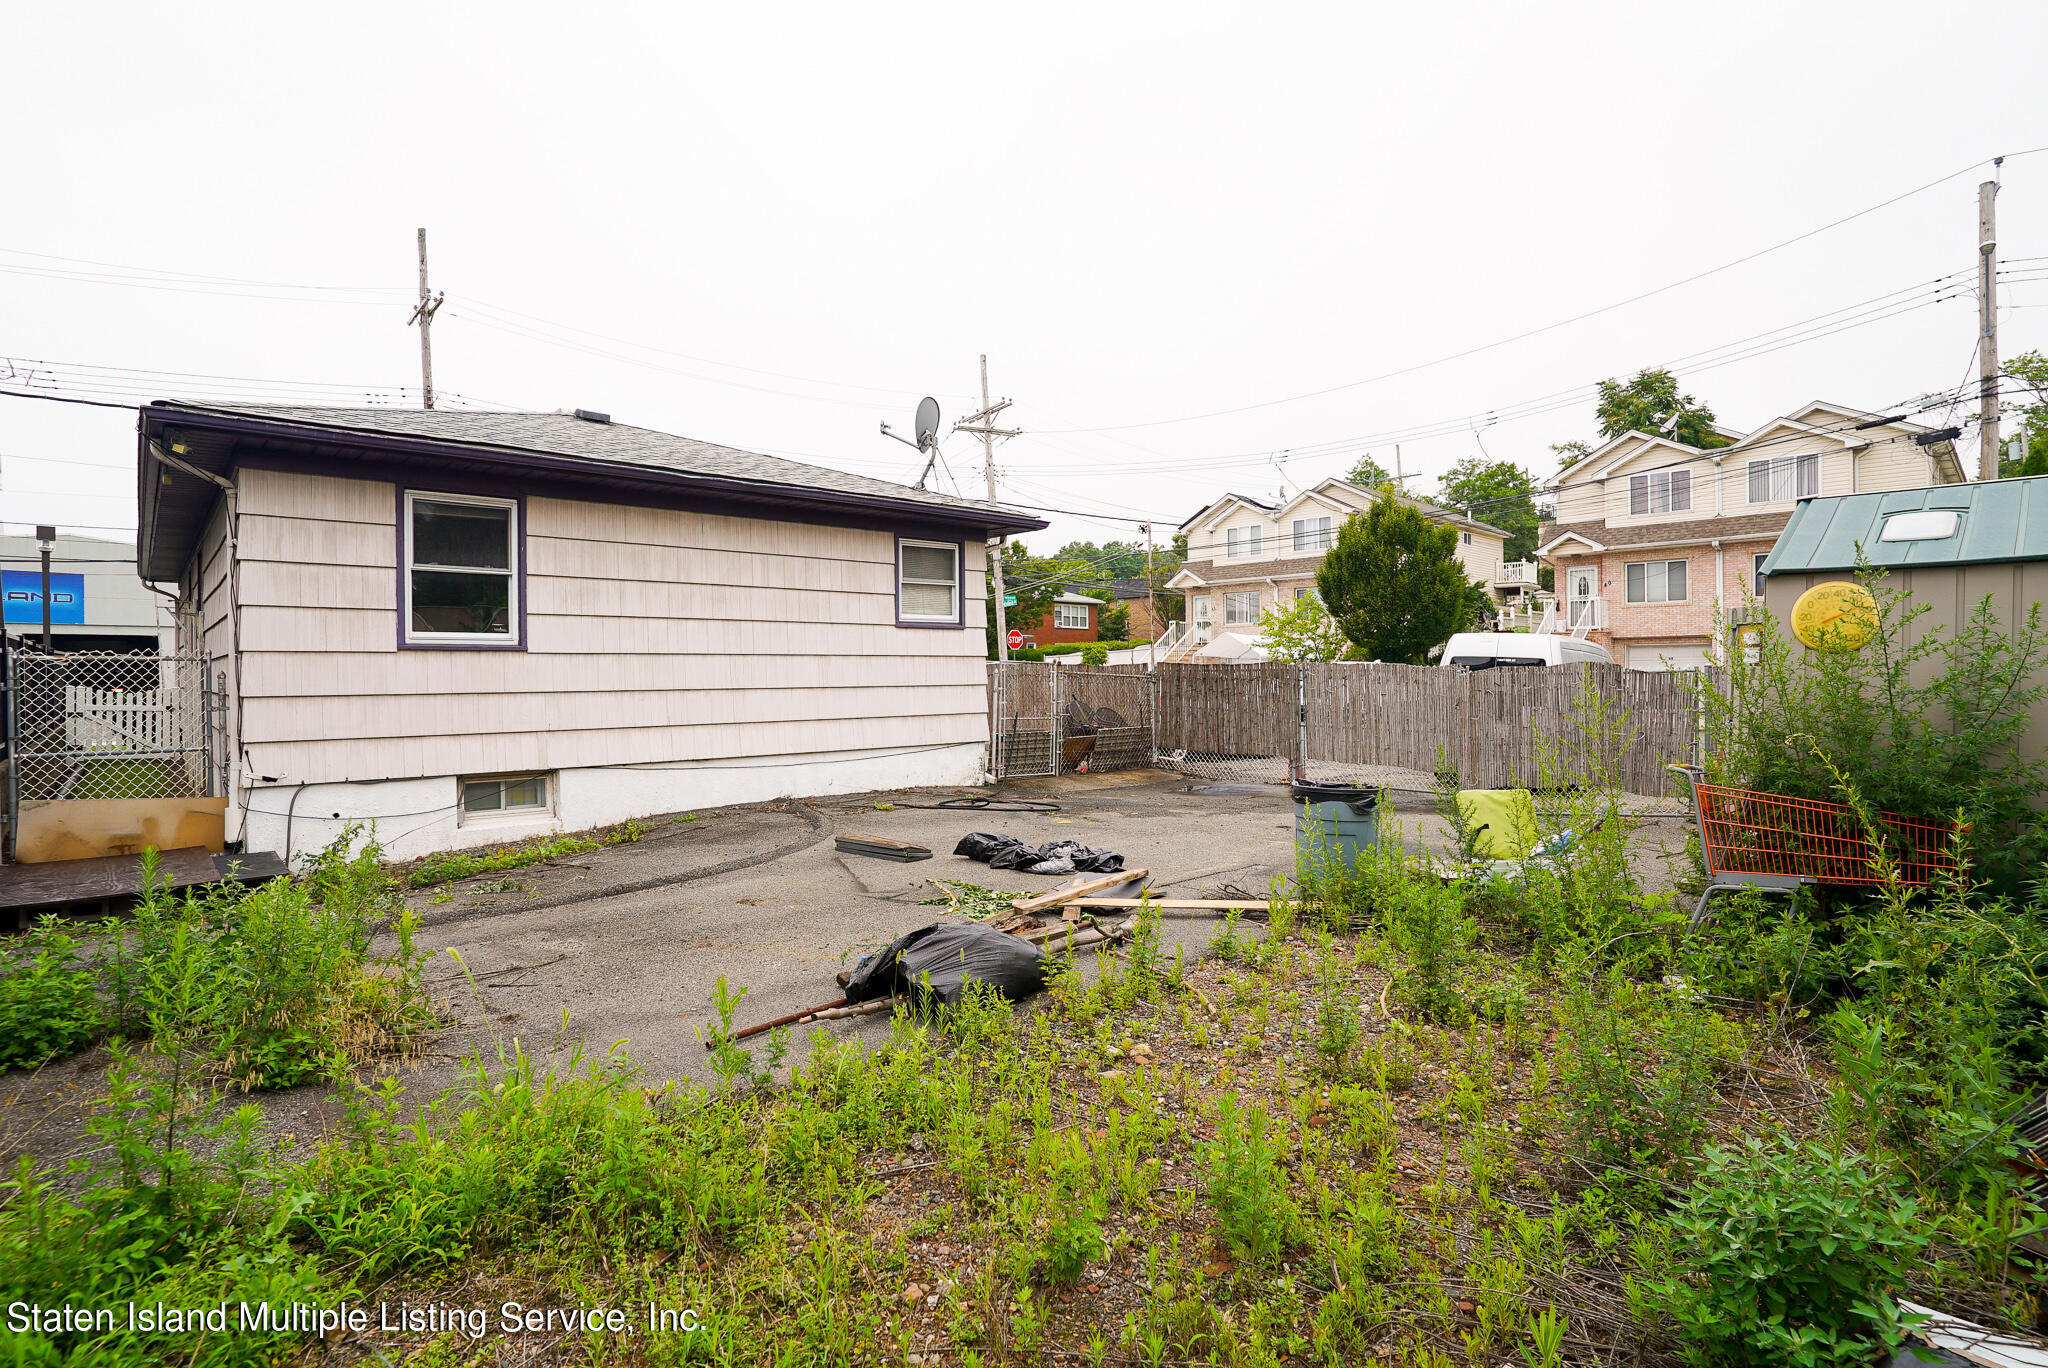 Single Family - Detached 121 Parkinson Avenue  Staten Island, NY 10305, MLS-1147747-27